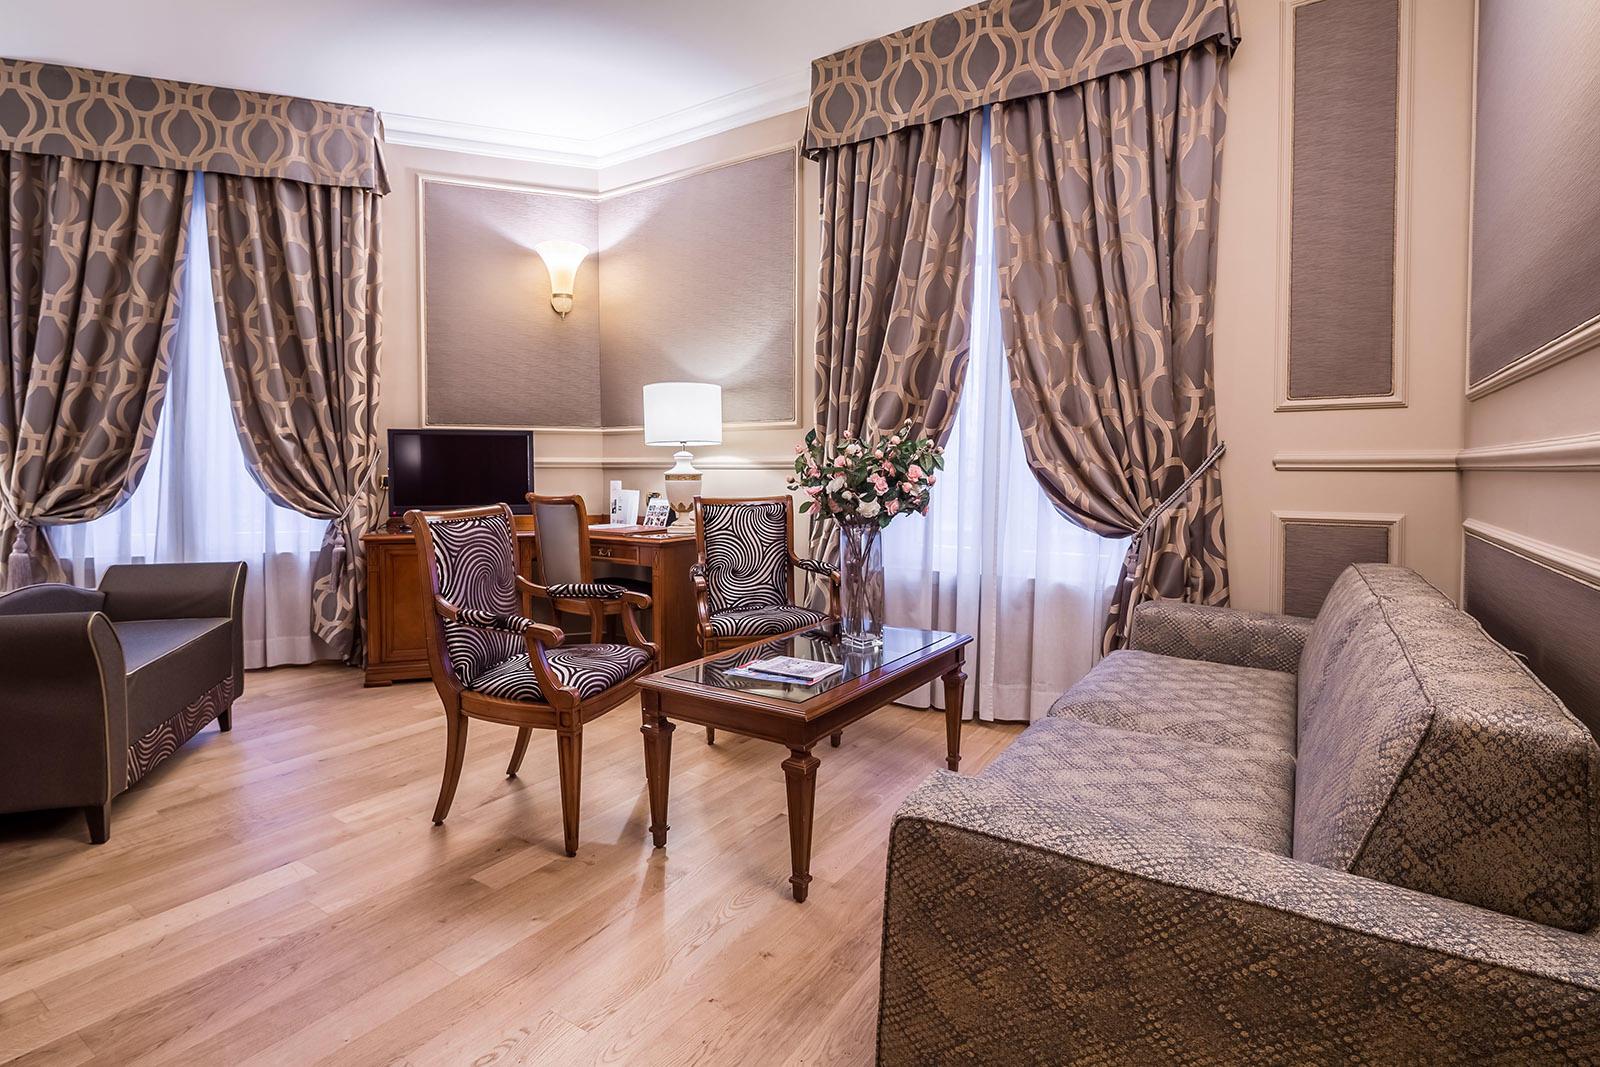 Junior Suite at Grand Visconti Palace in Milan